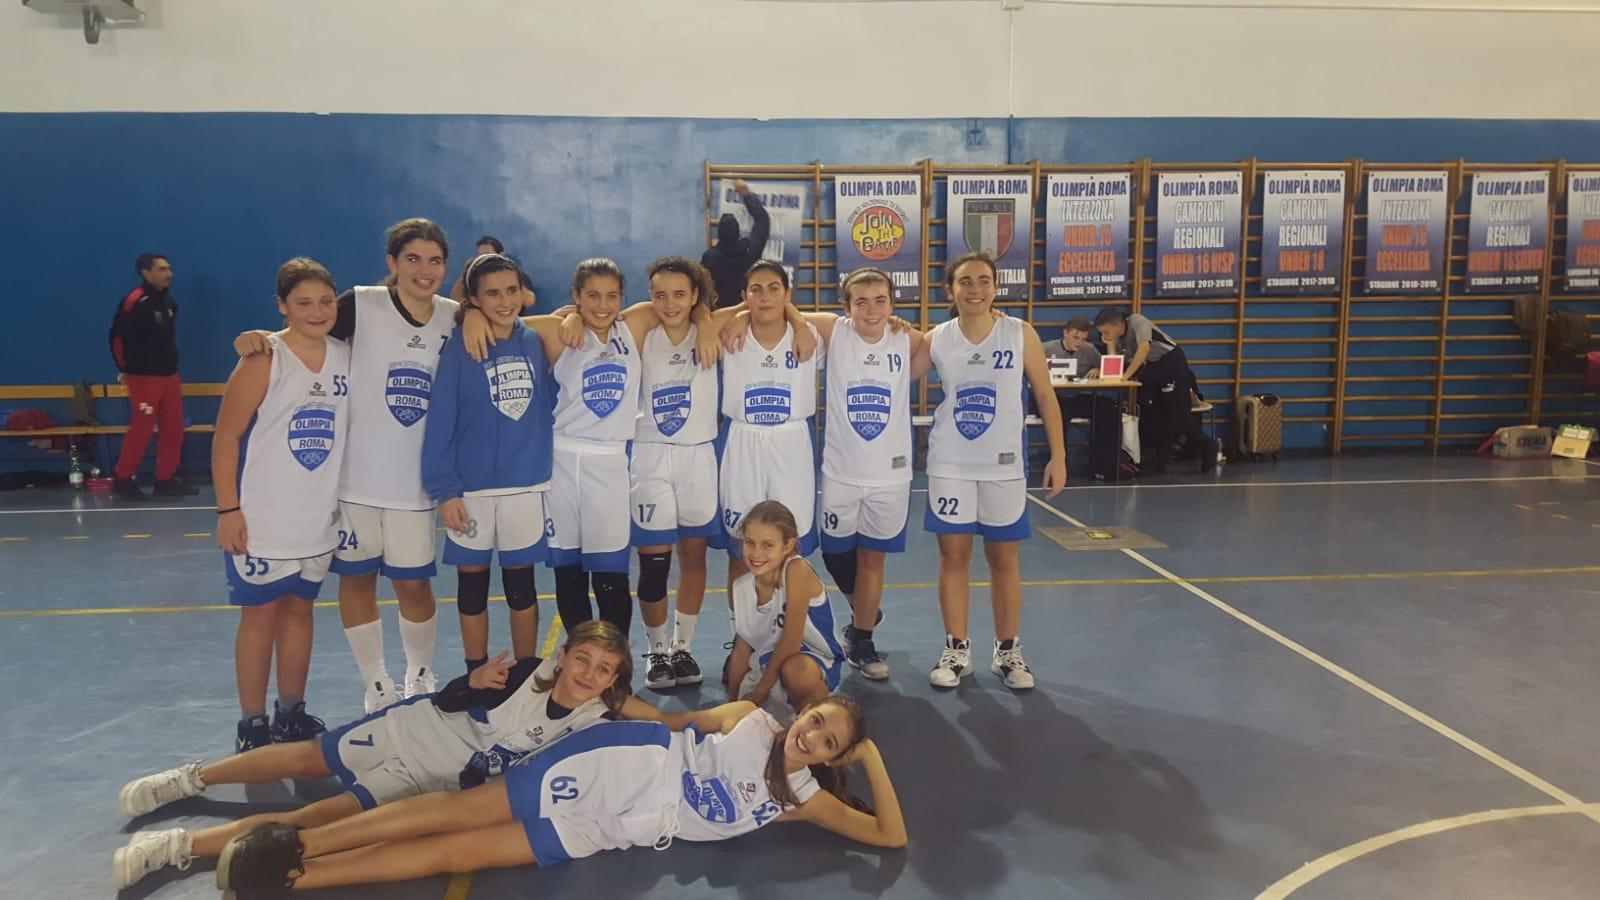 U14F Olimpia Roma - Academy Latina 65-45 1